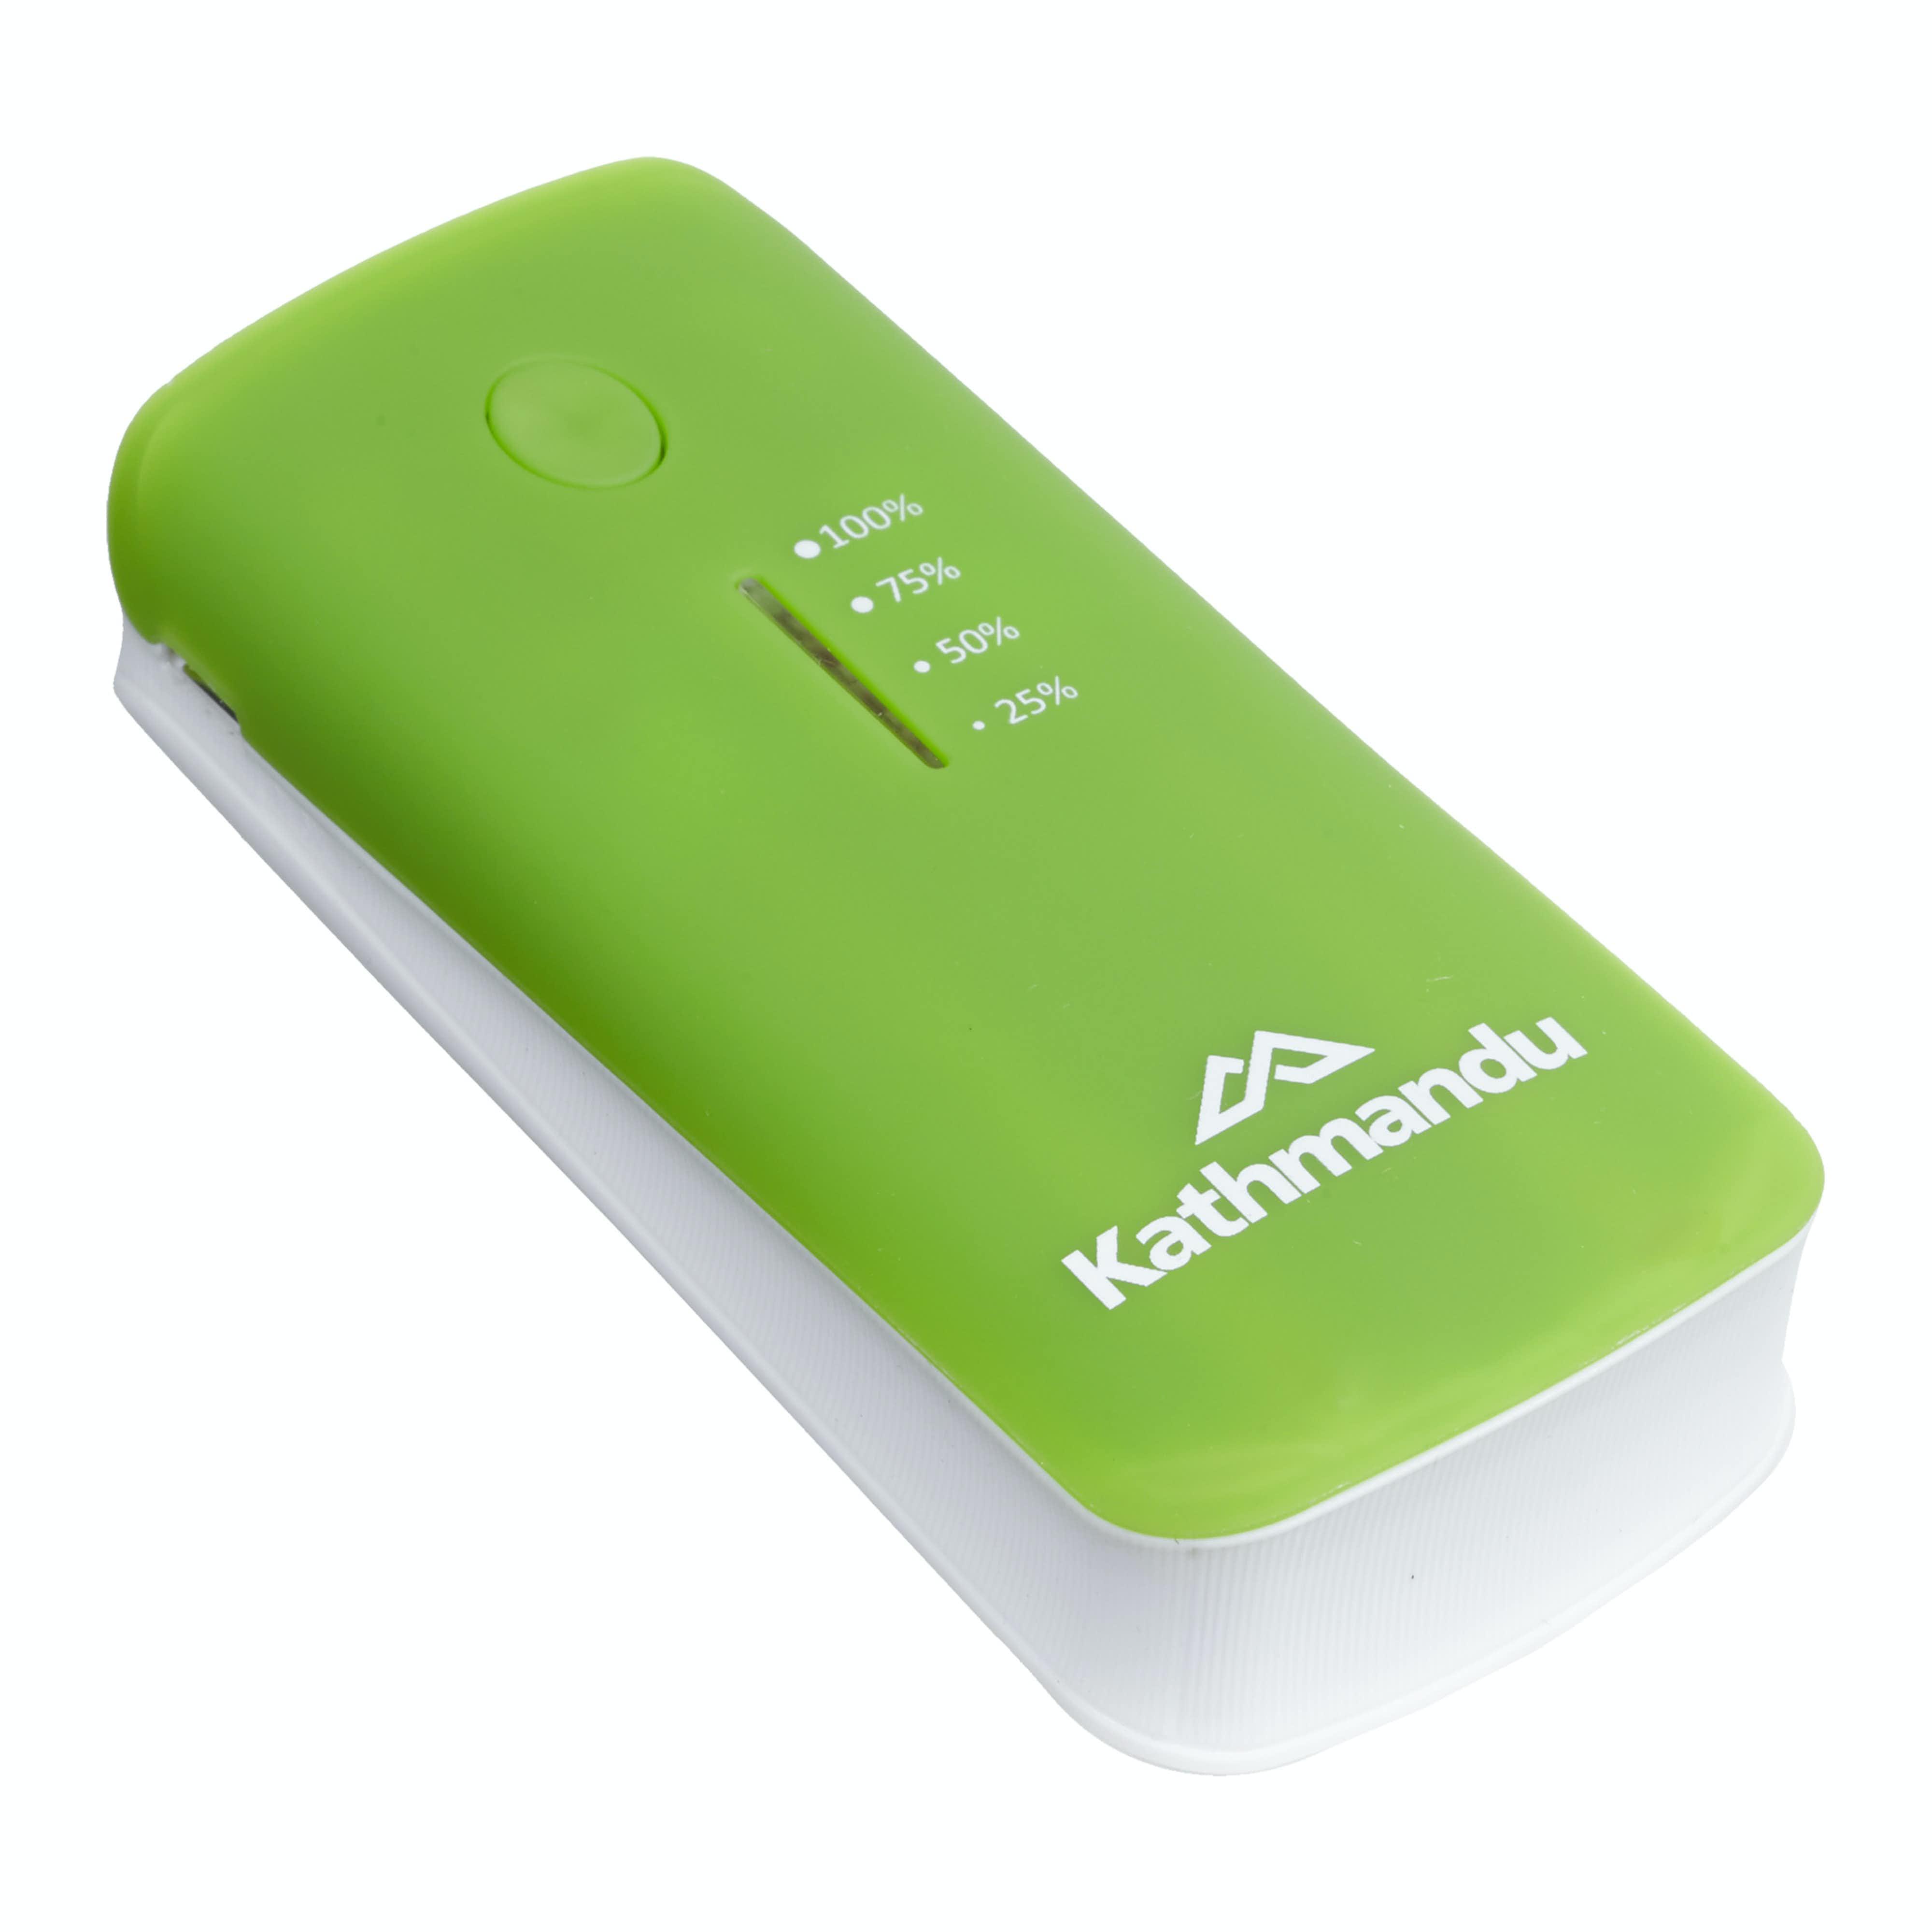 Power Bank 5200mAH - Icon Green 110953367c97